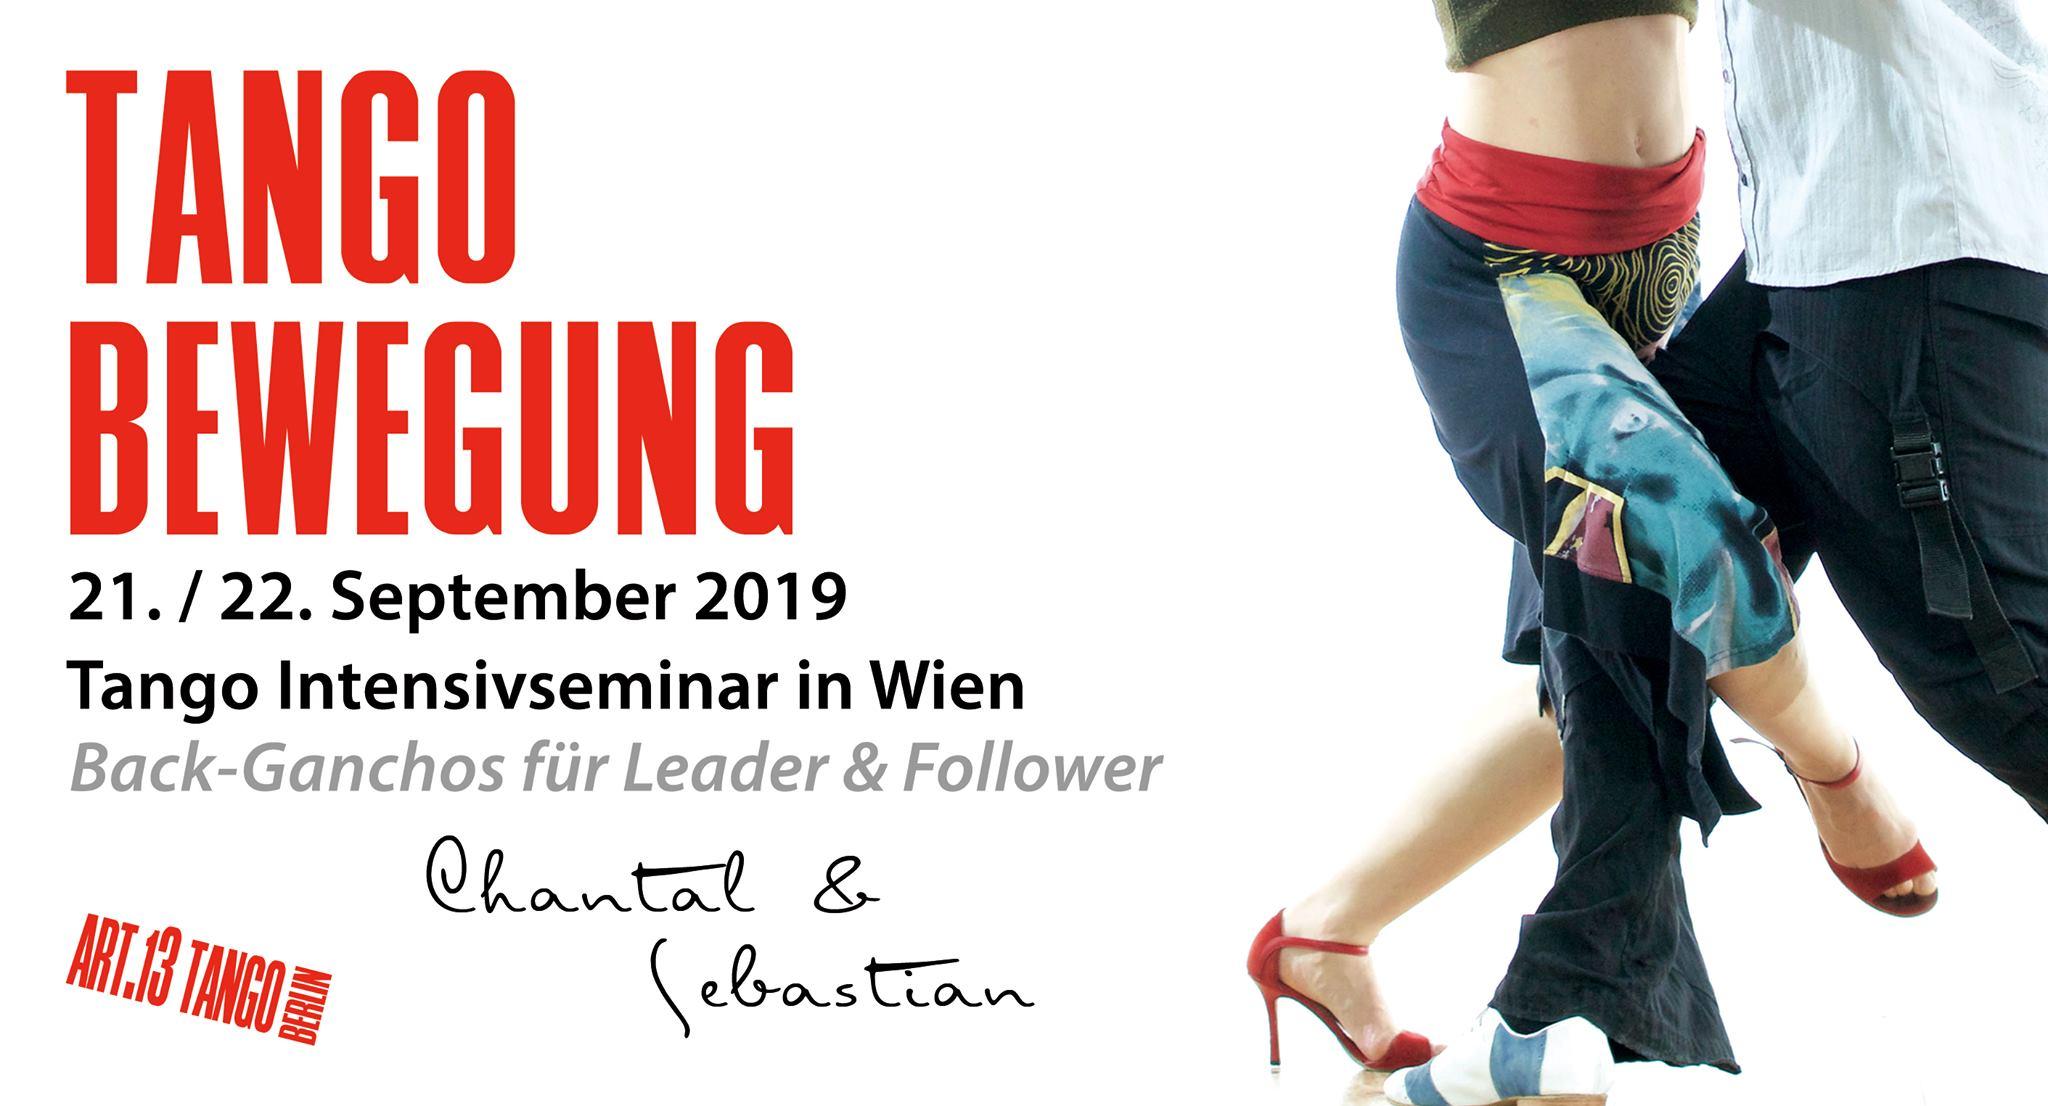 tango-intensivseminar-sebastian-chantal-wien-2019